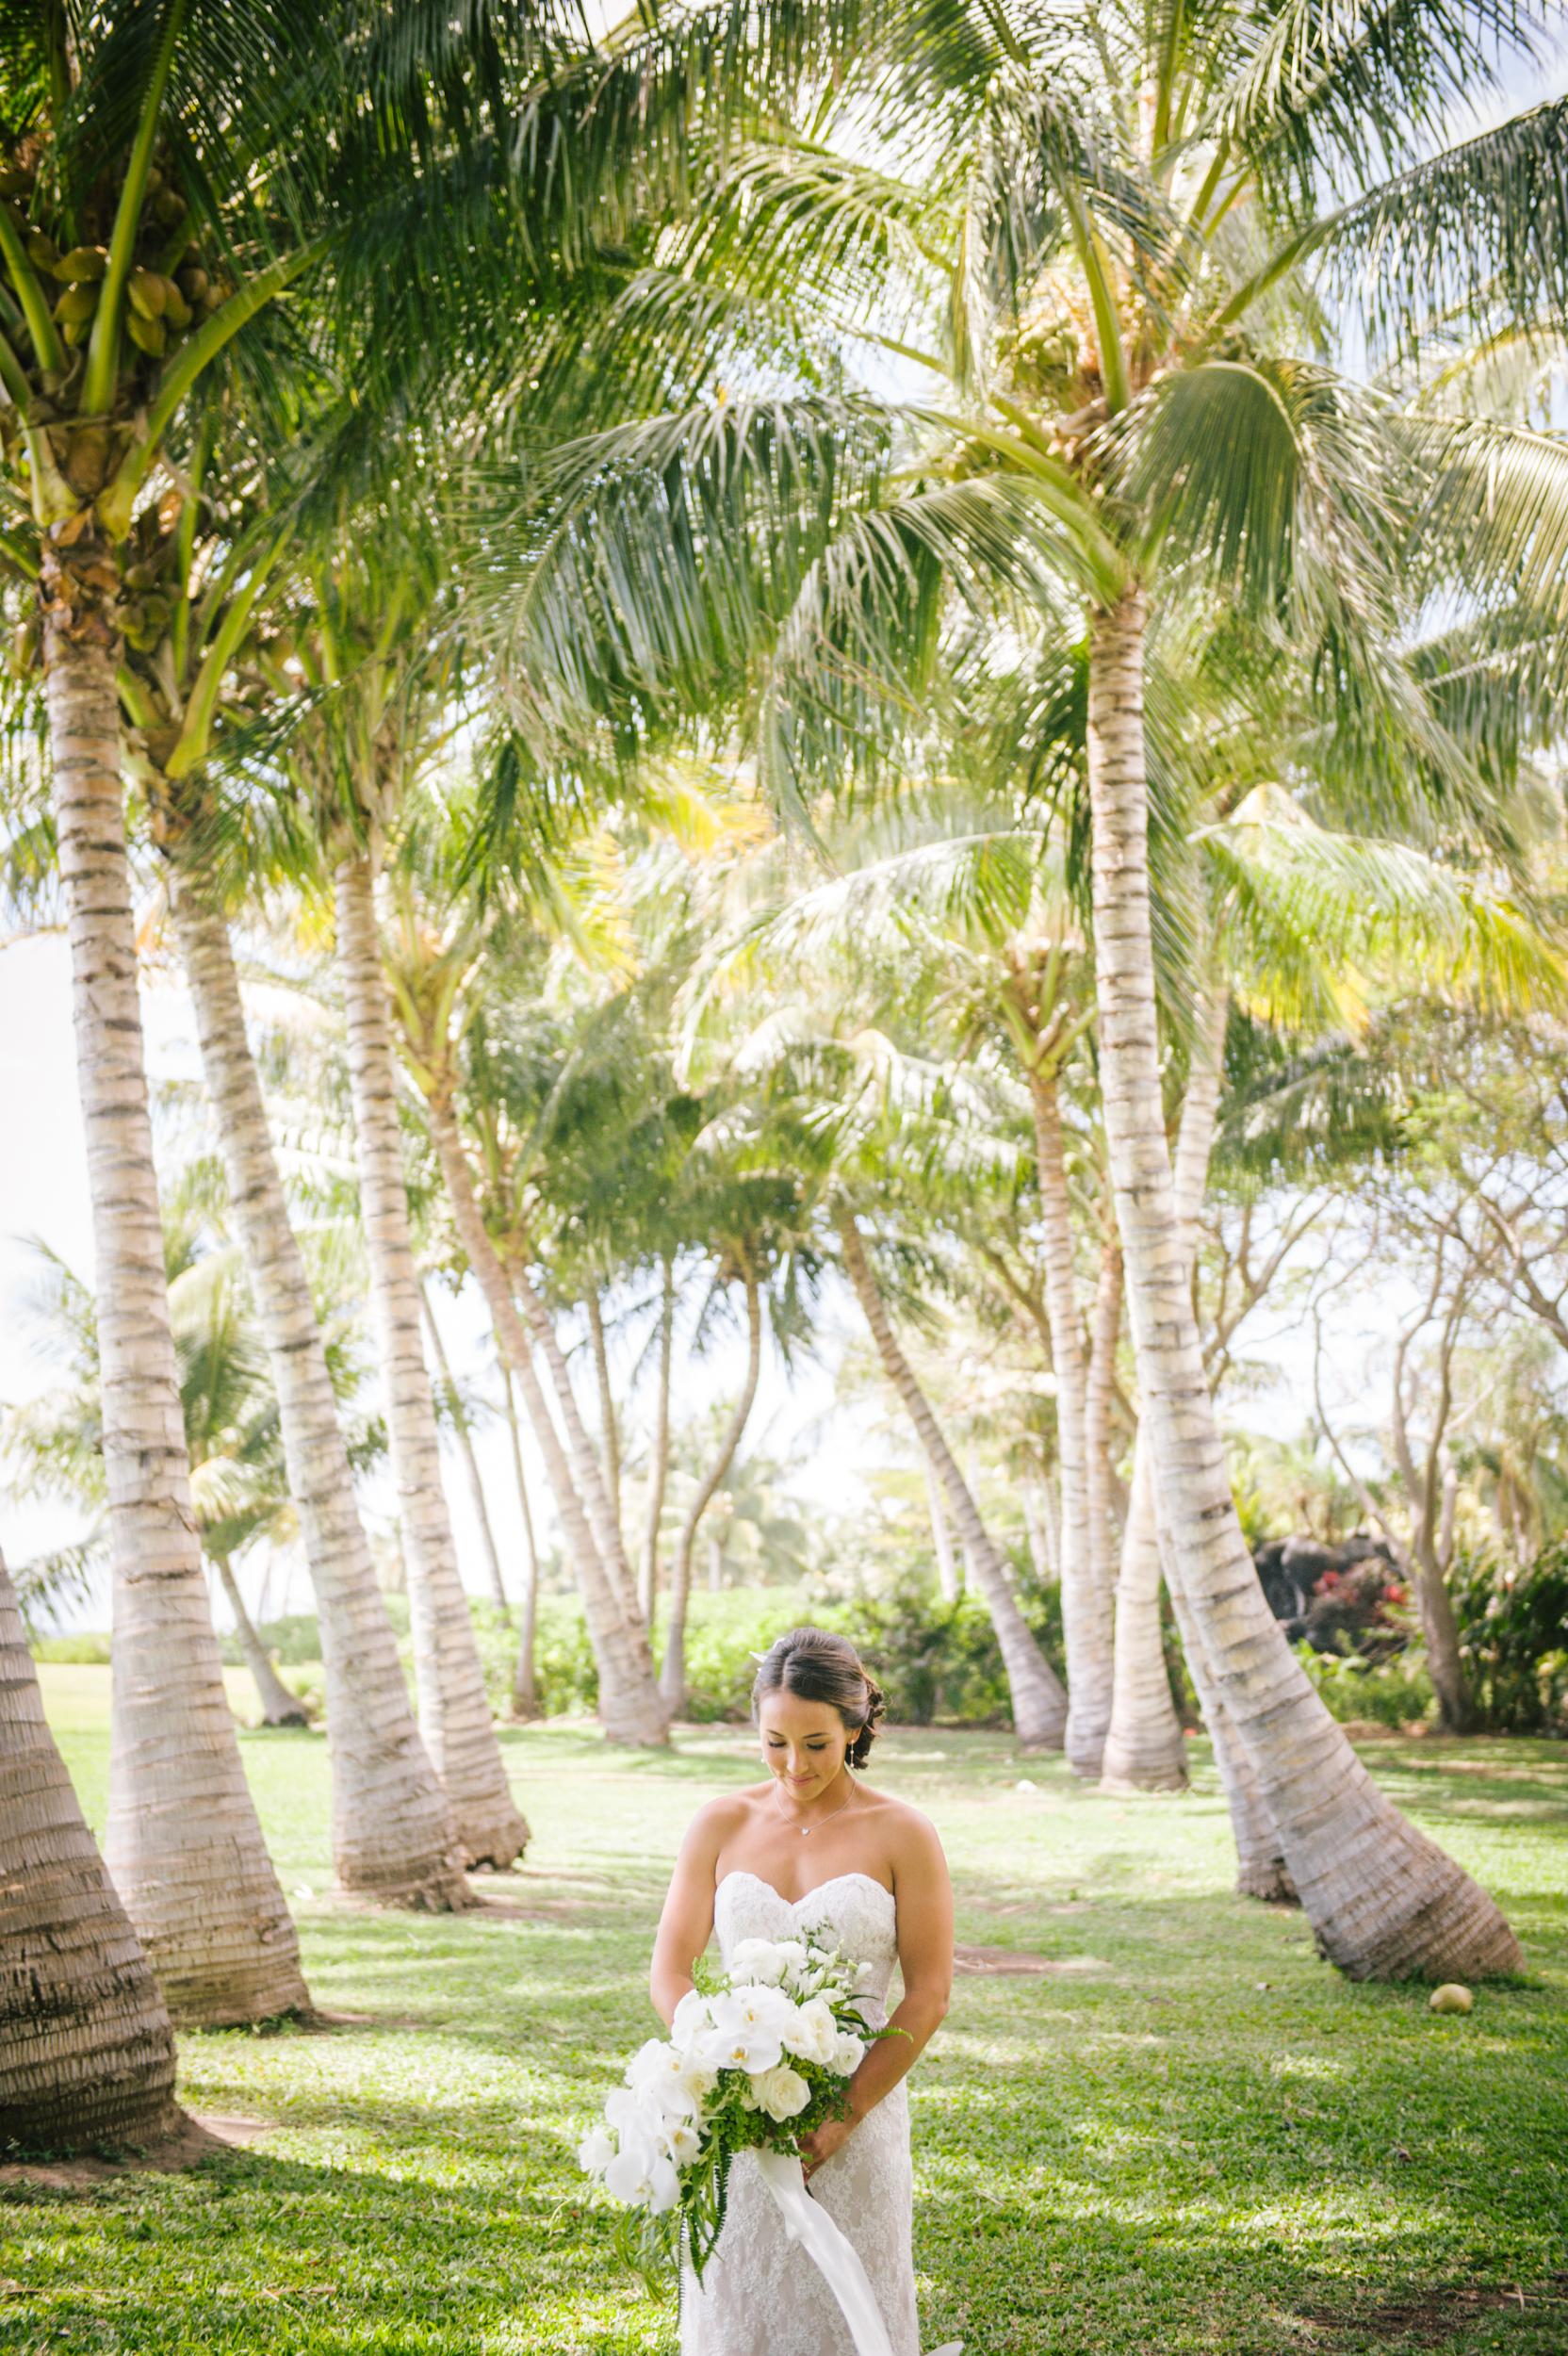 JKP-Destination-Weddings-0057.JPG